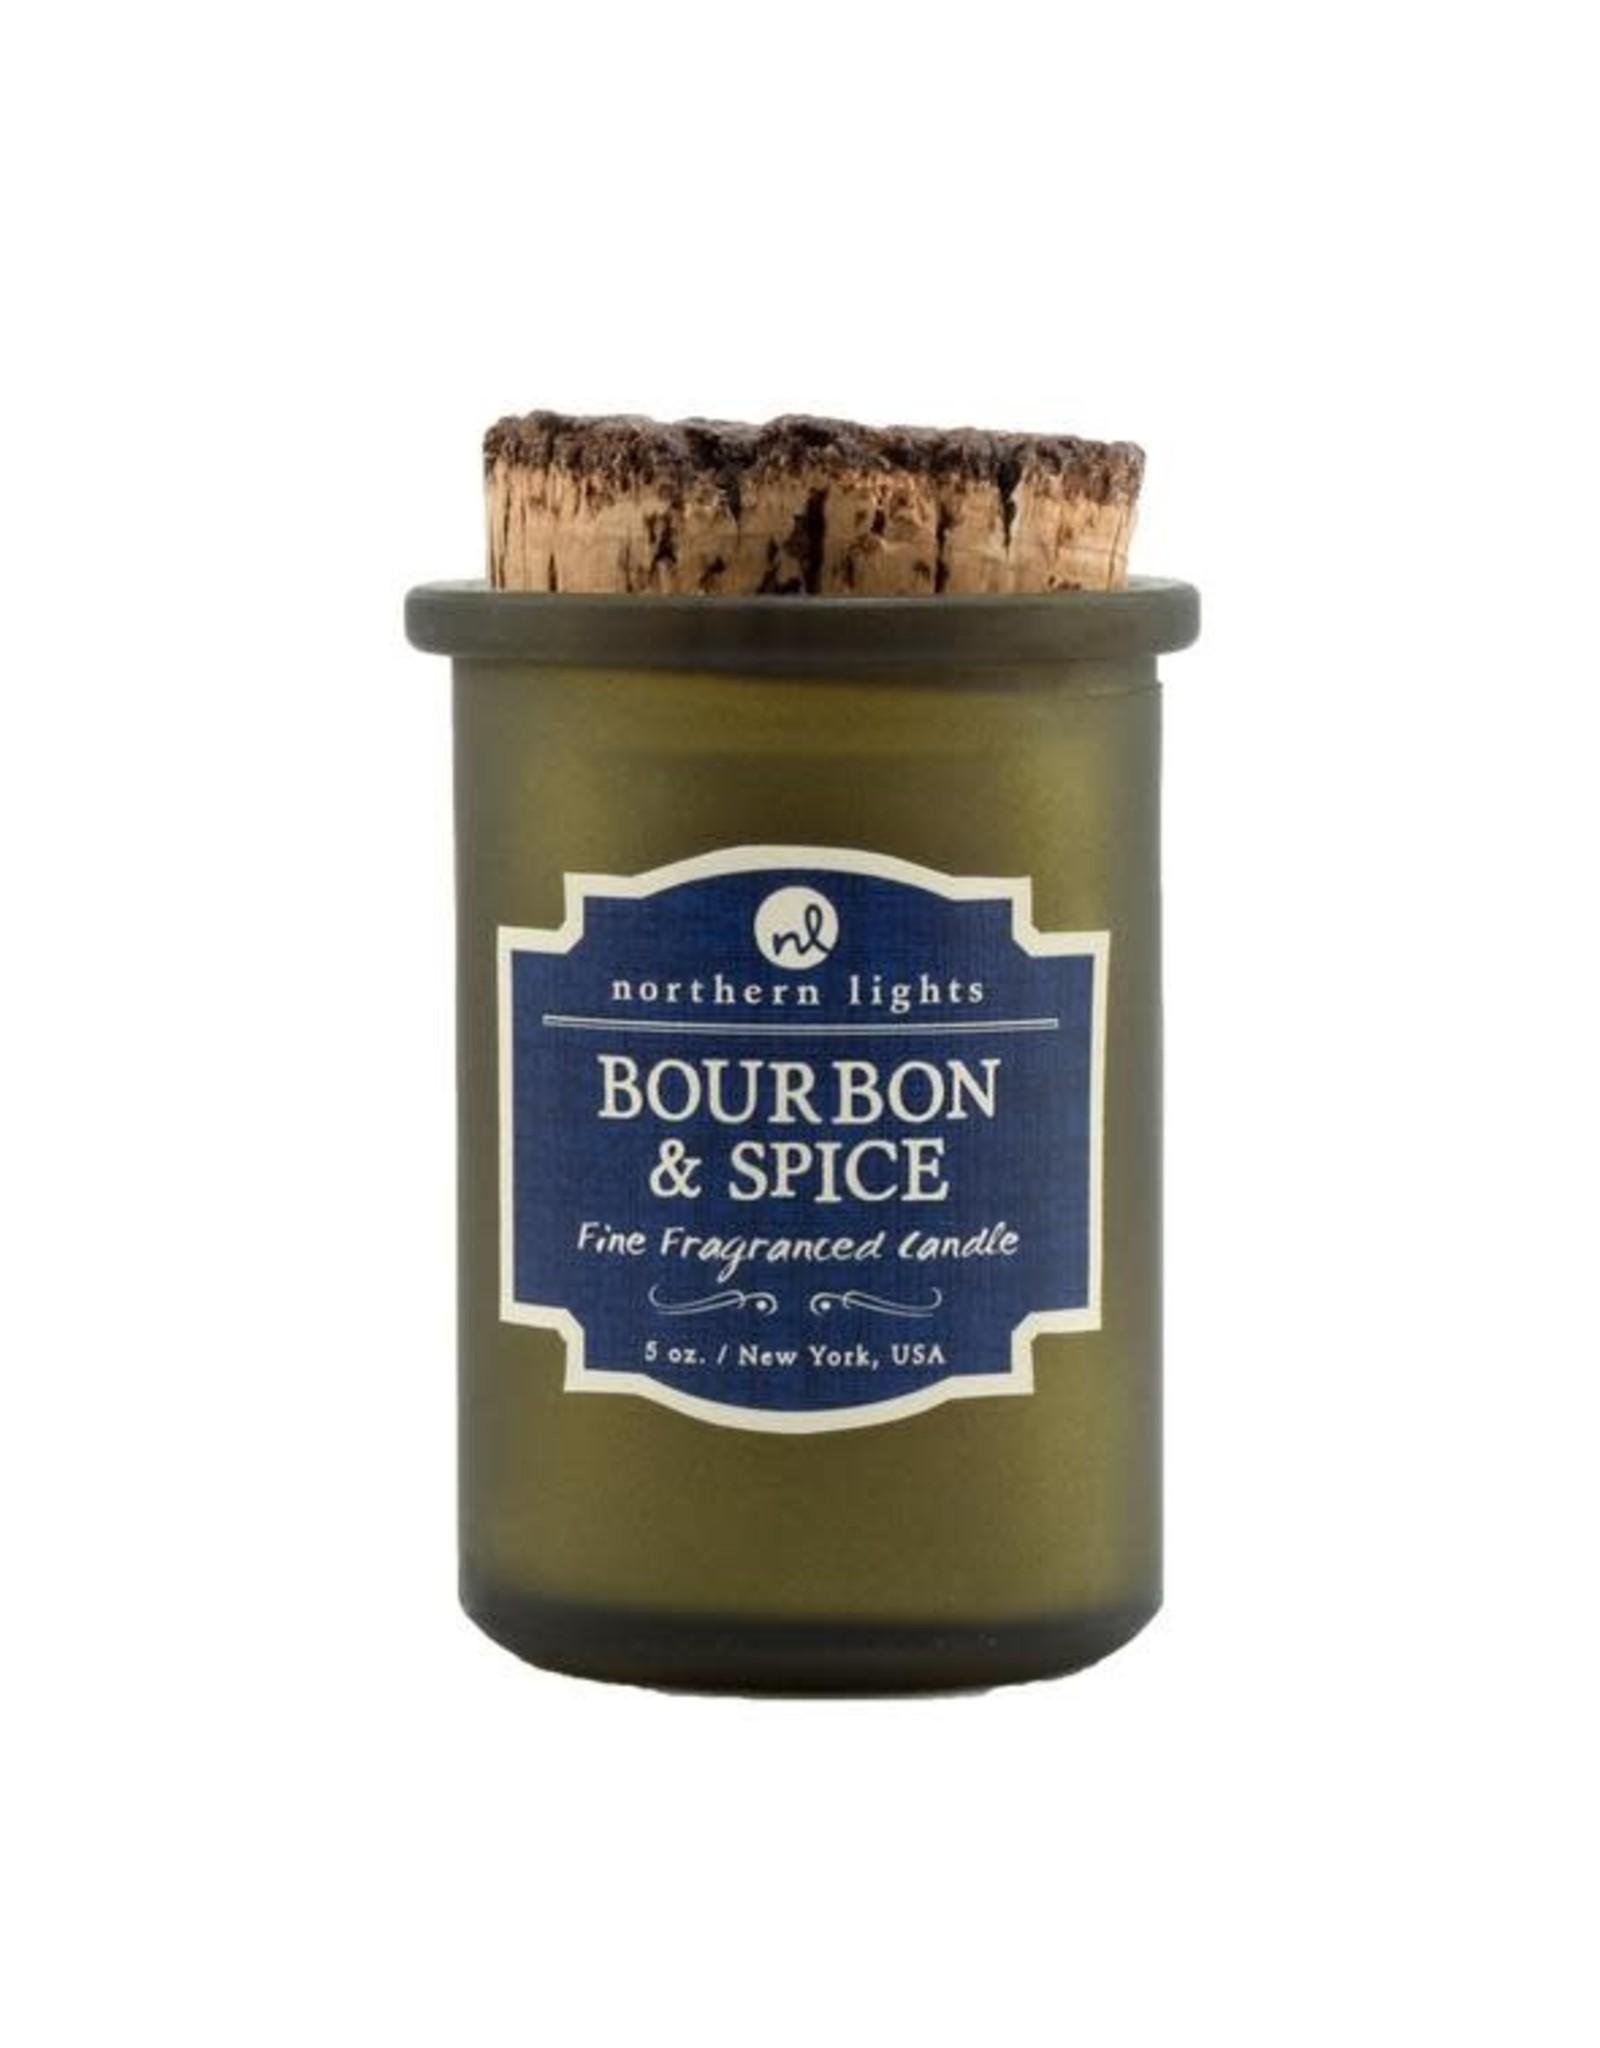 Northern Lights Candles Bourbon & Spice 5oz Spirit Candle